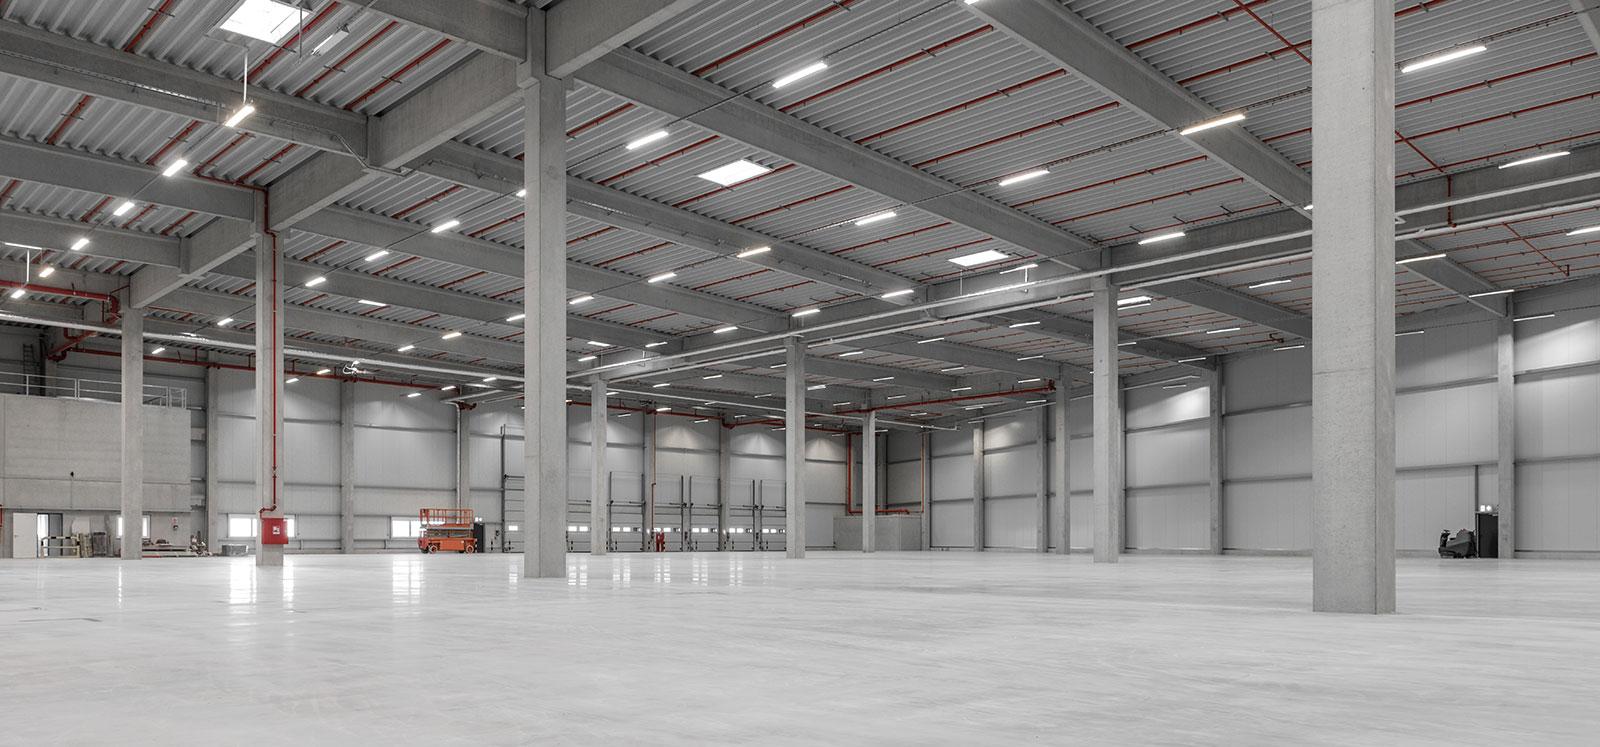 Warehouse Amp Industrial Led Retrofit Michigan